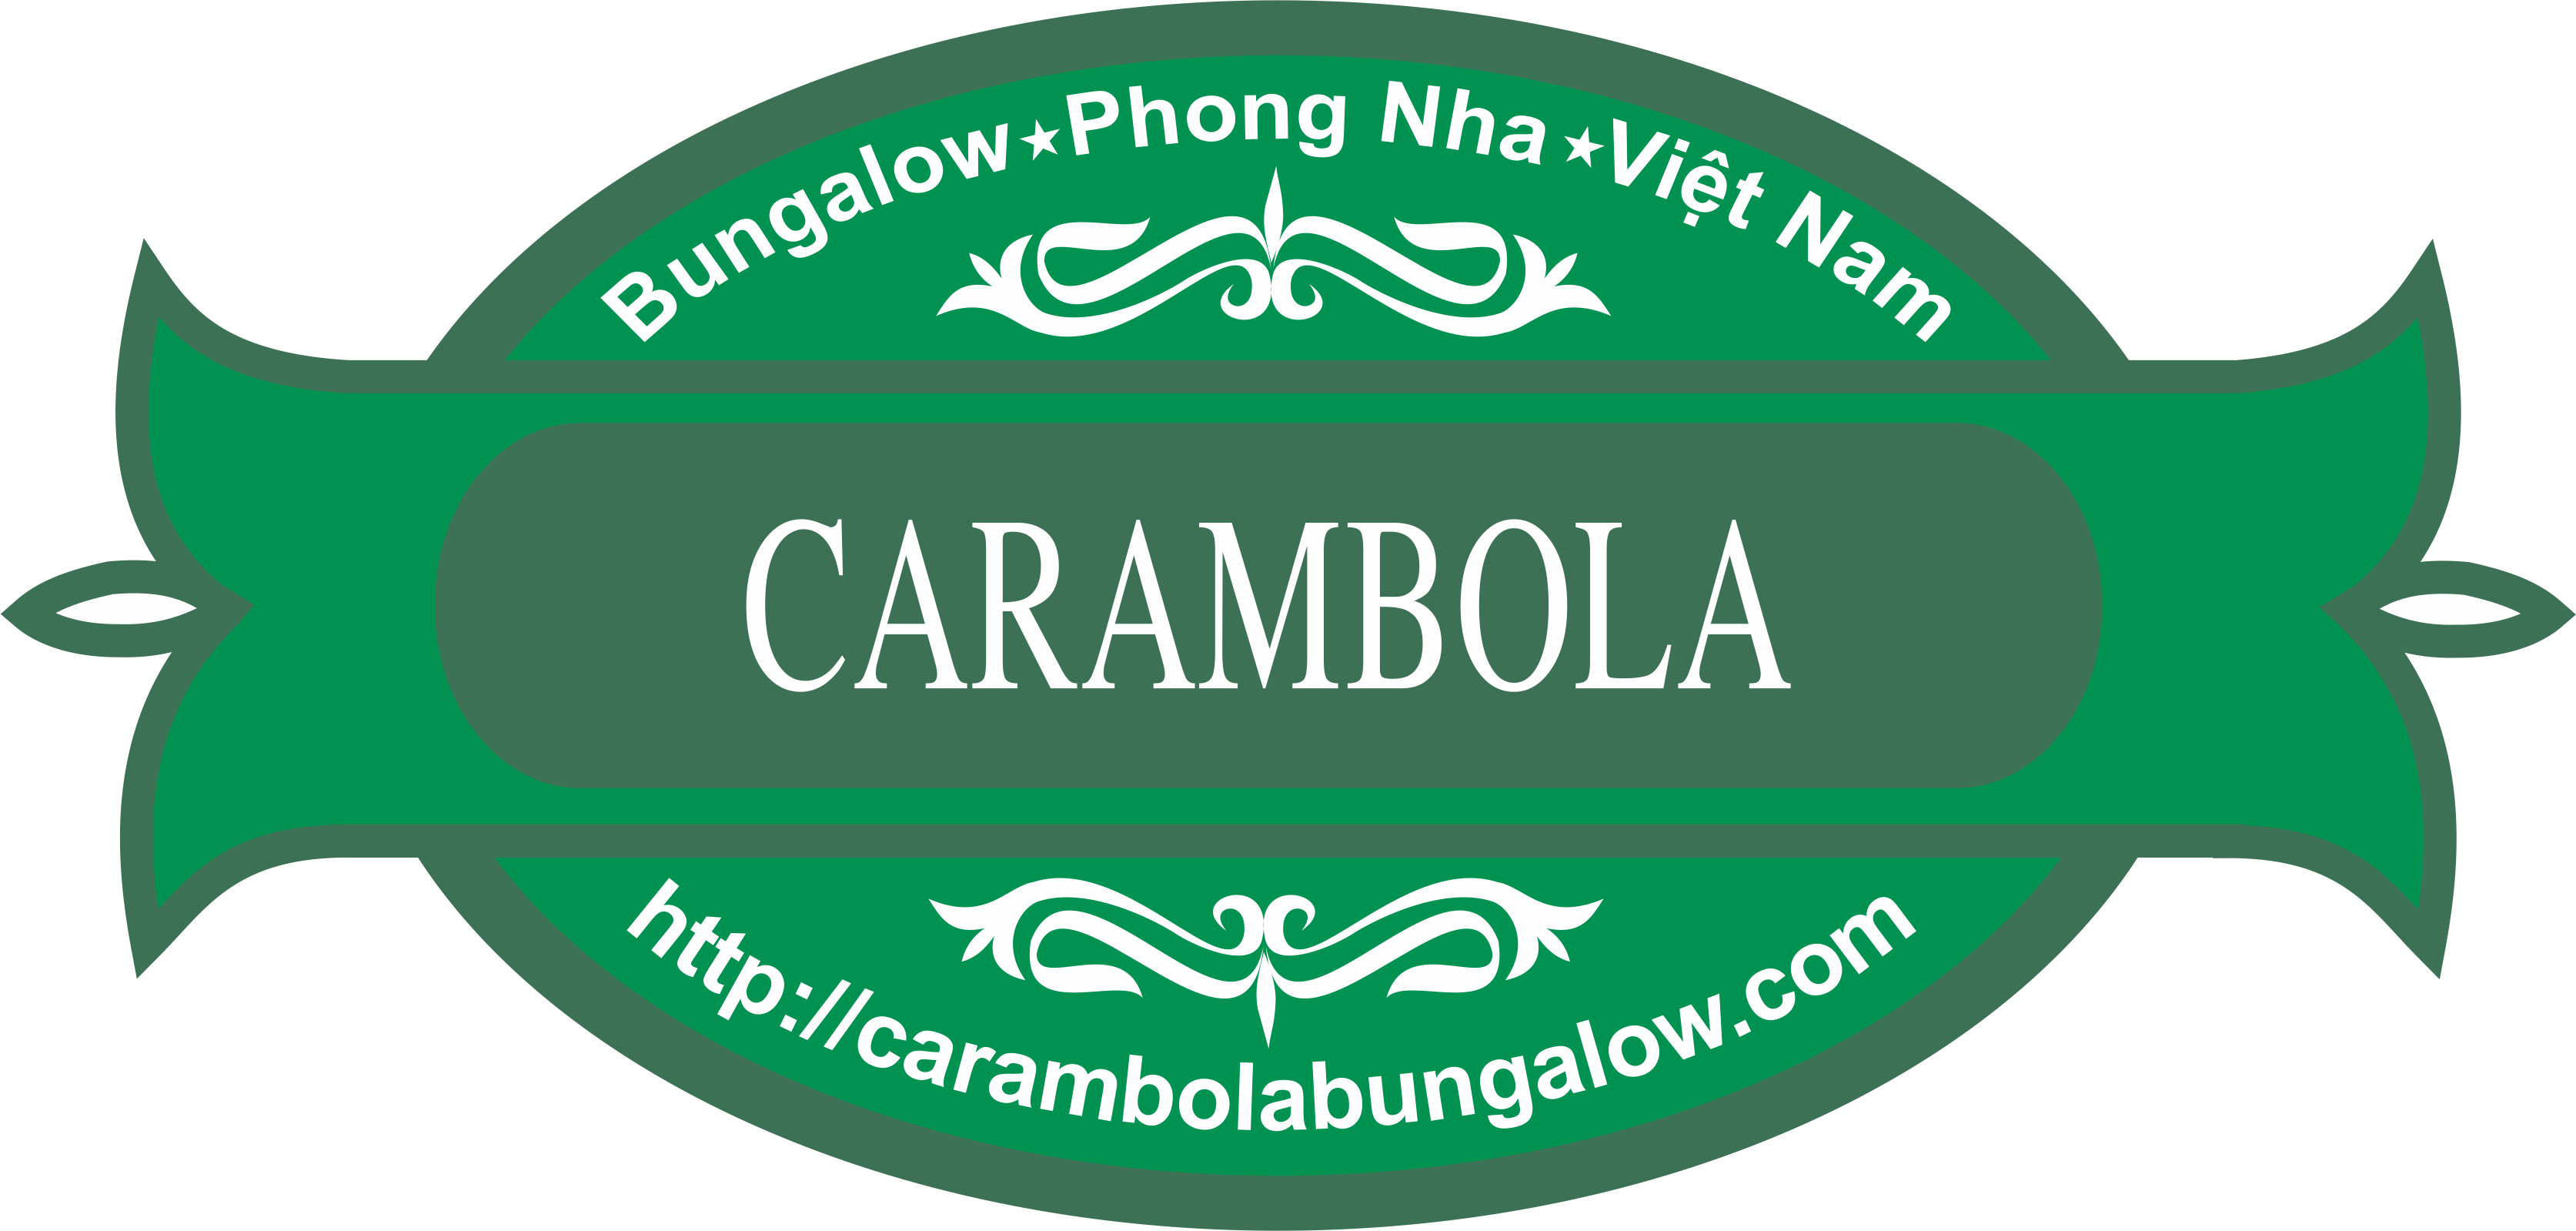 Carambola Bungalow